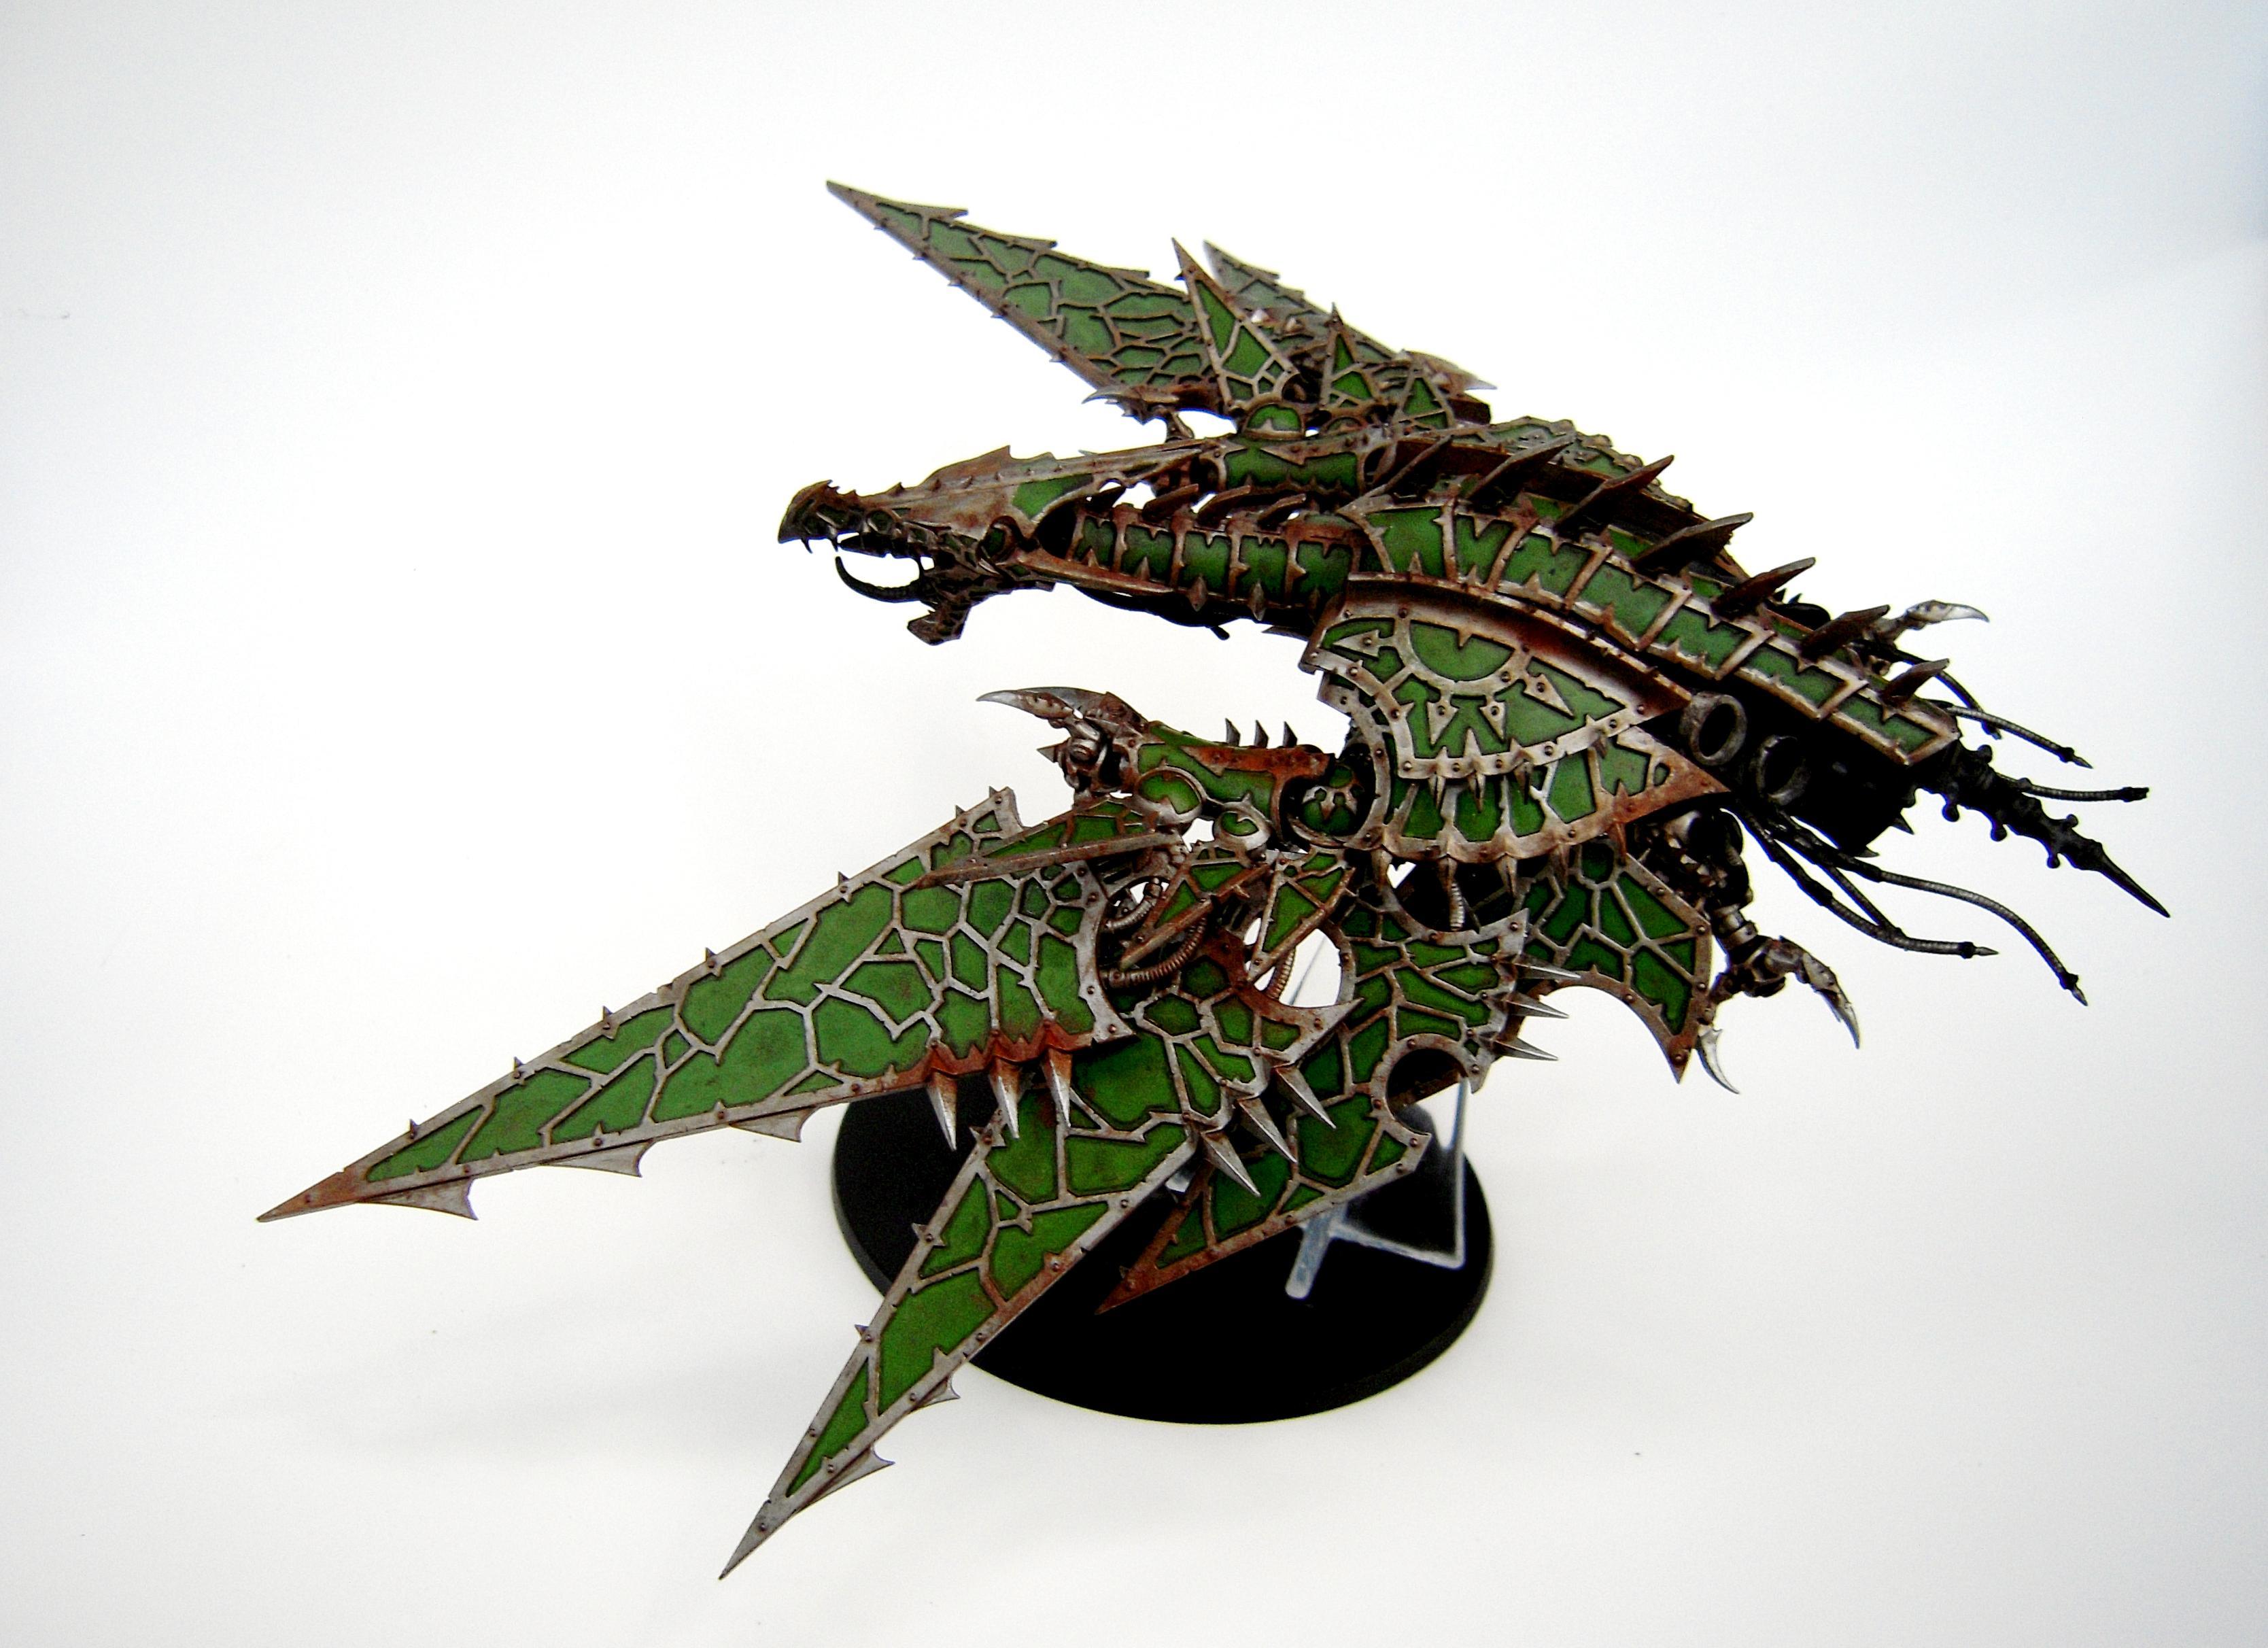 Chaos Space Marines, Helldrake, Nurgle, Warhammer 40,000